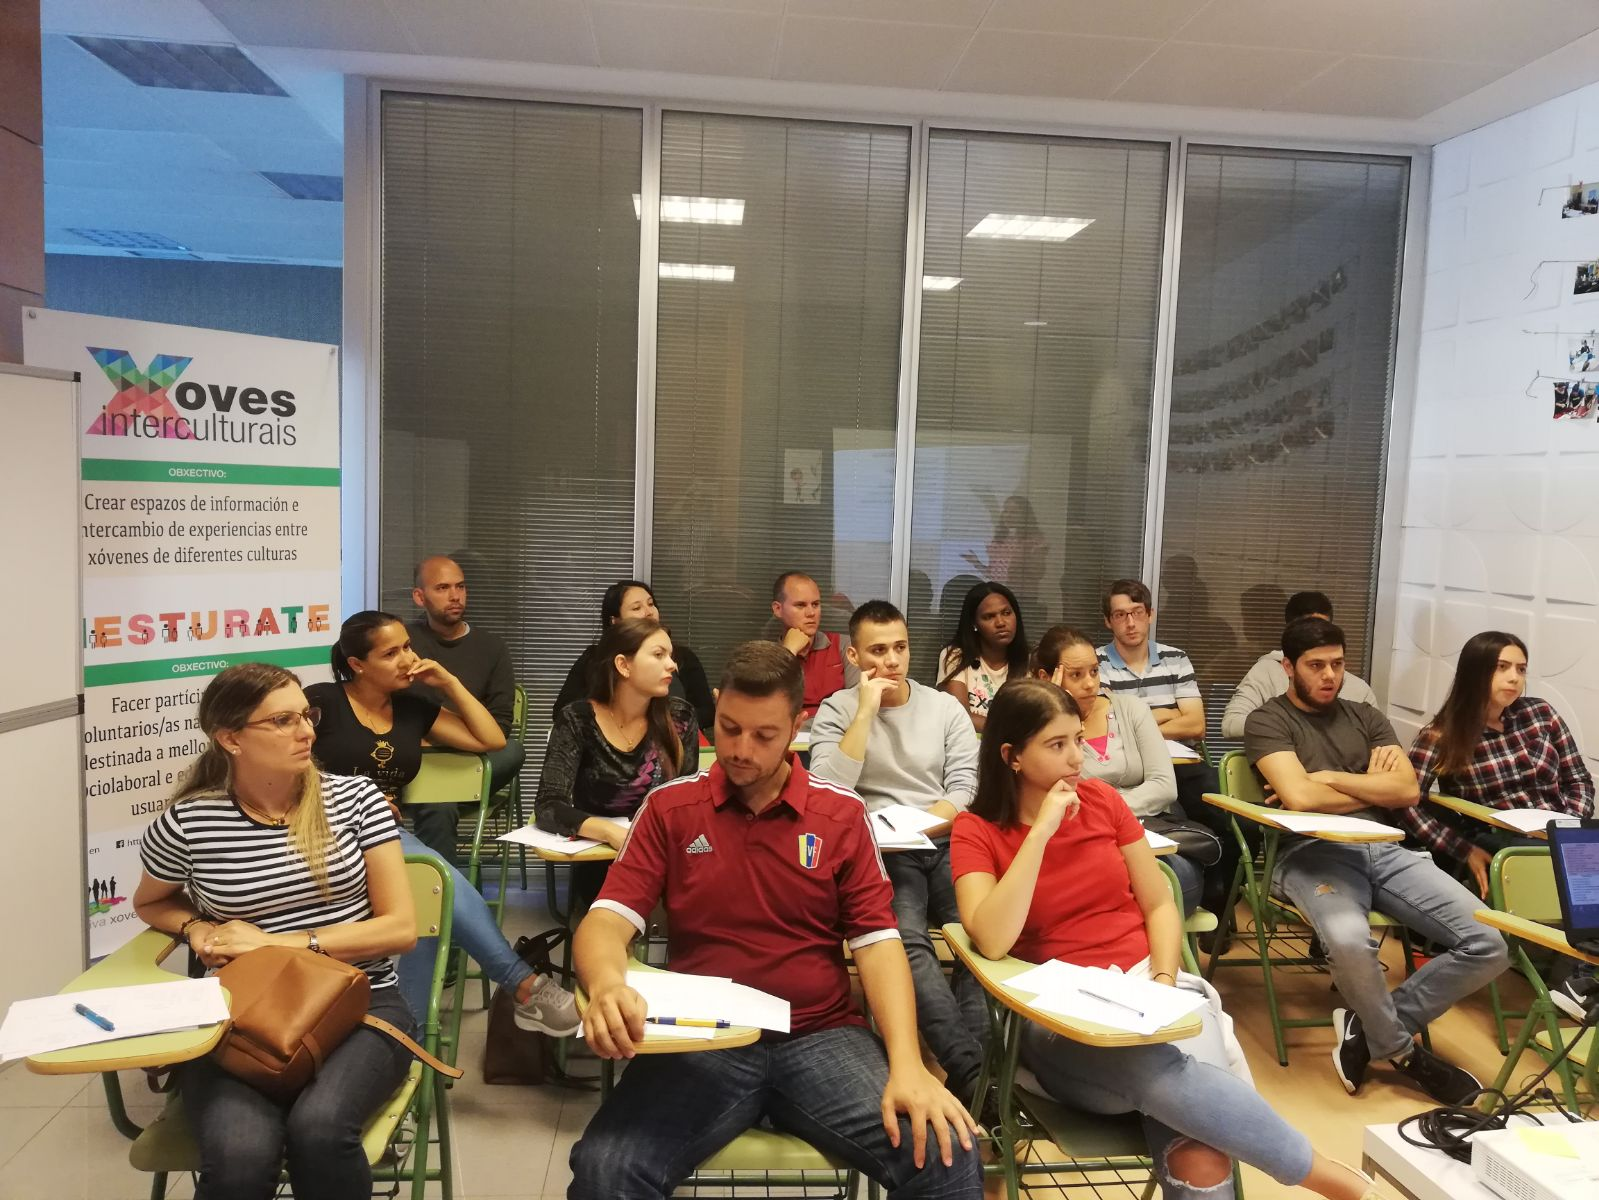 Xoves Interculturais, xunta de galicia, orientacion laboral, motivacion, formacion, curso,